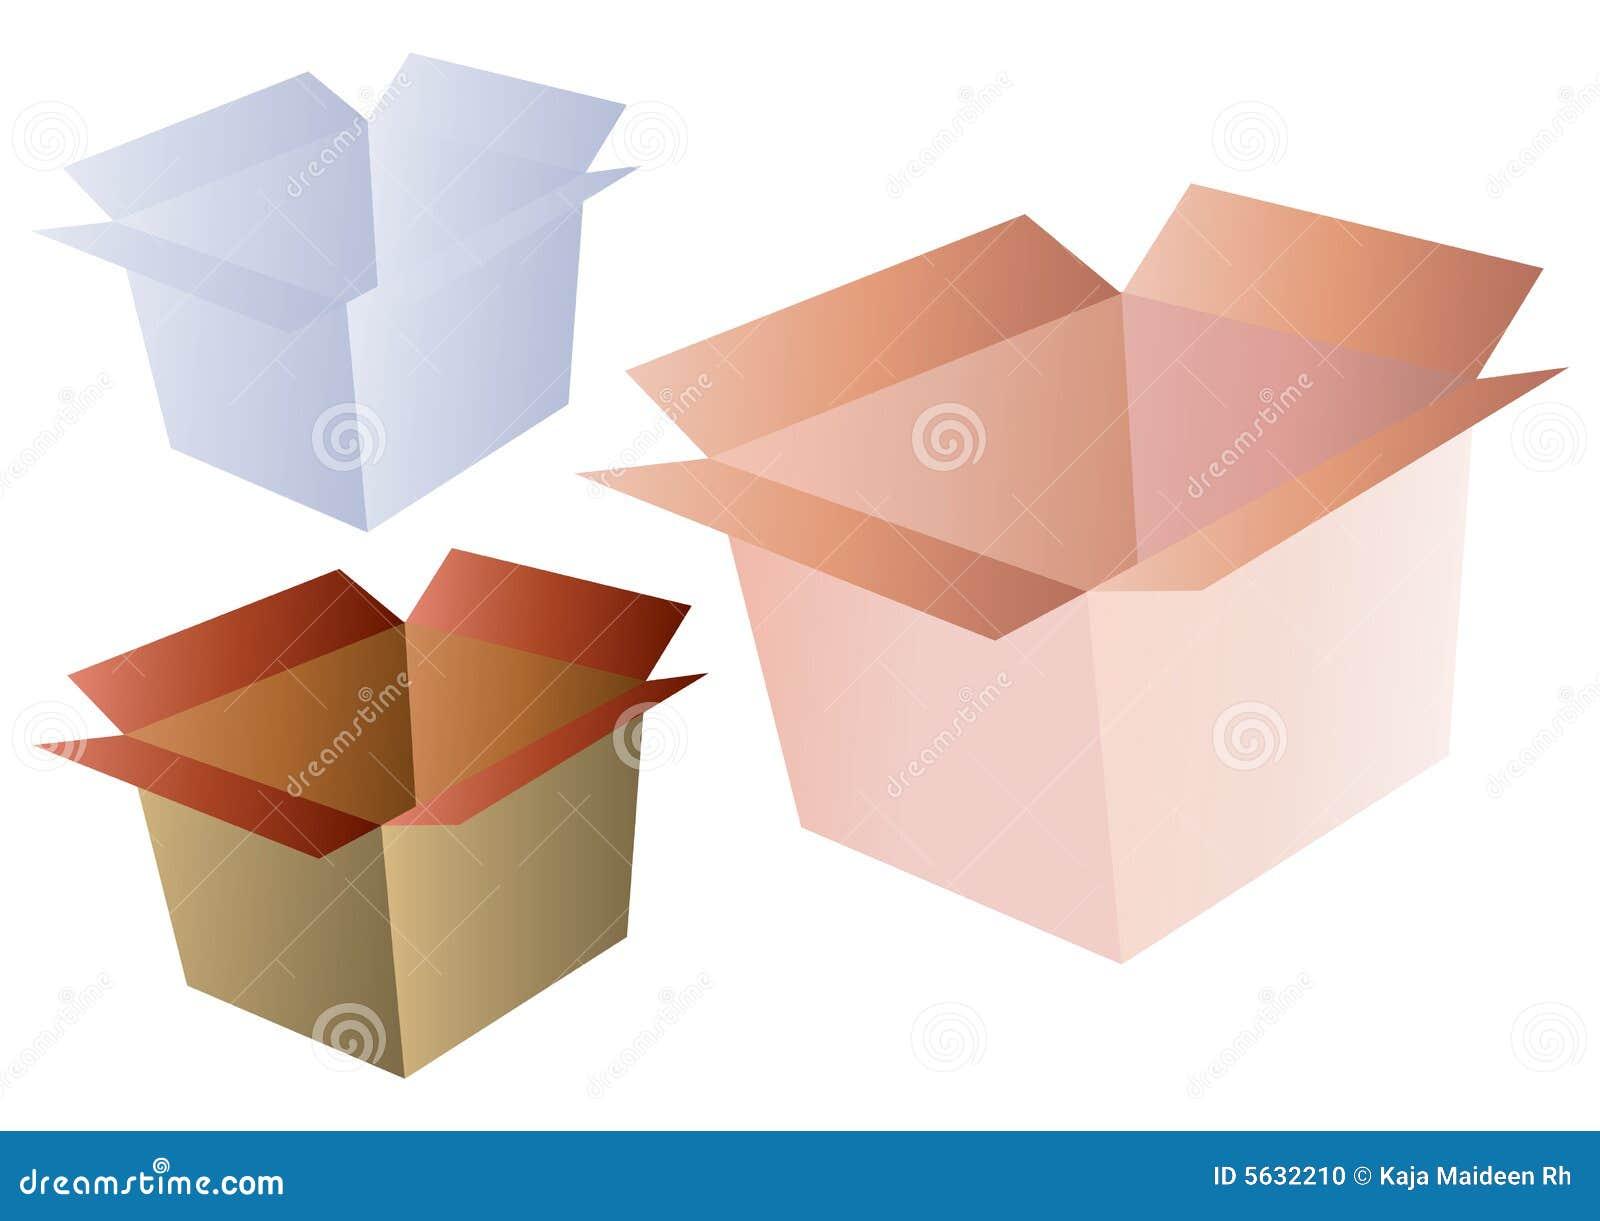 Shipping Box Vector Stock Photo - Image: 5632210